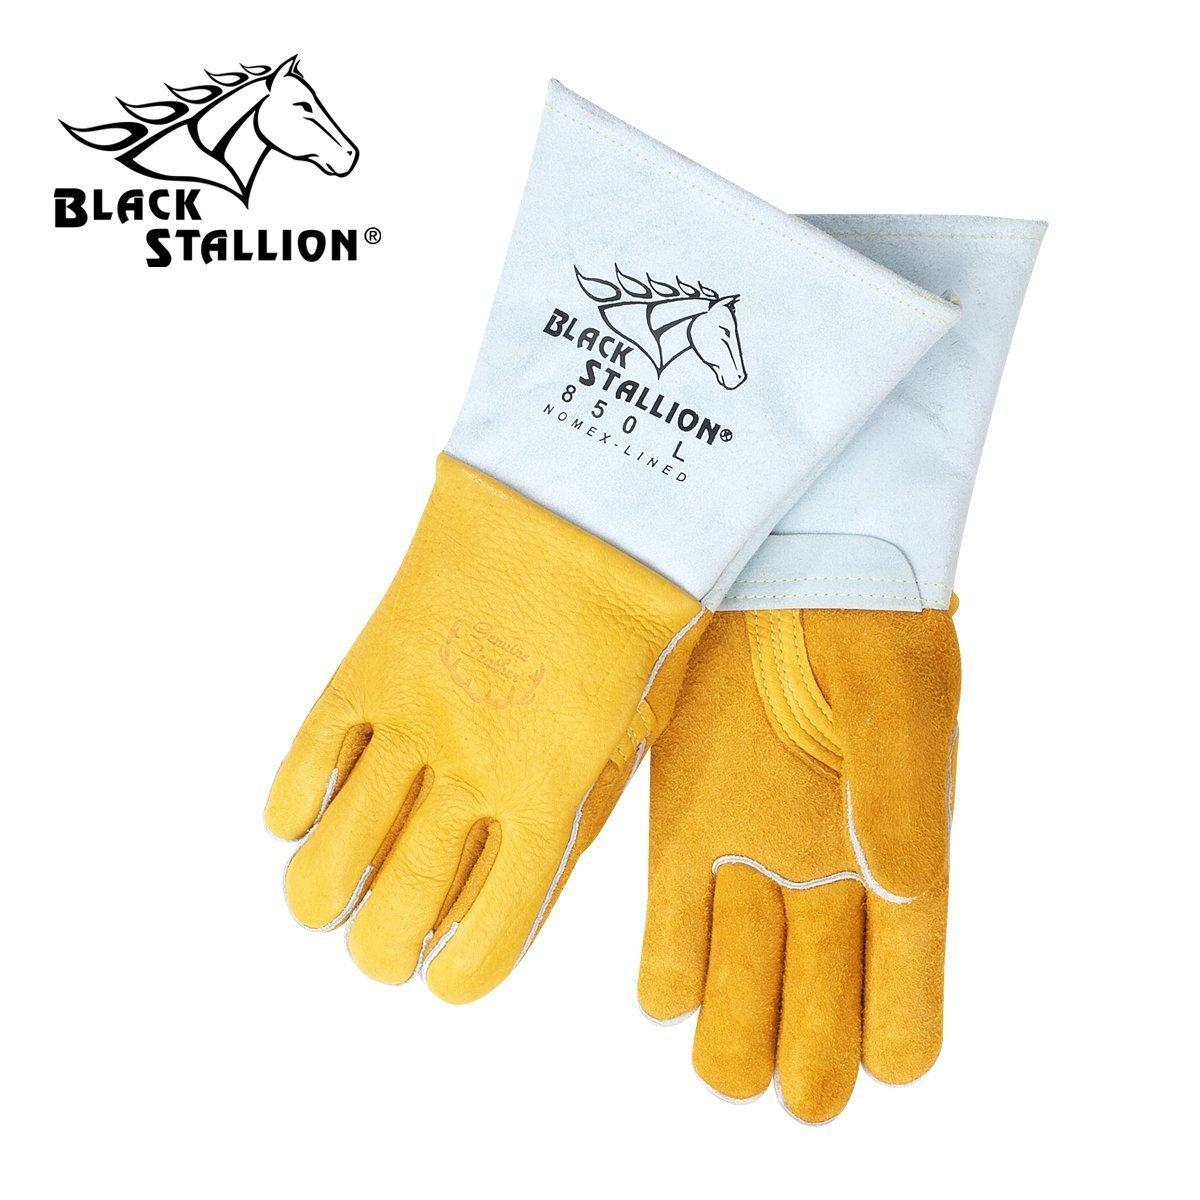 Size 2XLarge Revco Black Stallion 850-2XLarge Flame Resistant Nomex Lined Elkskin Stick Welding Gloves